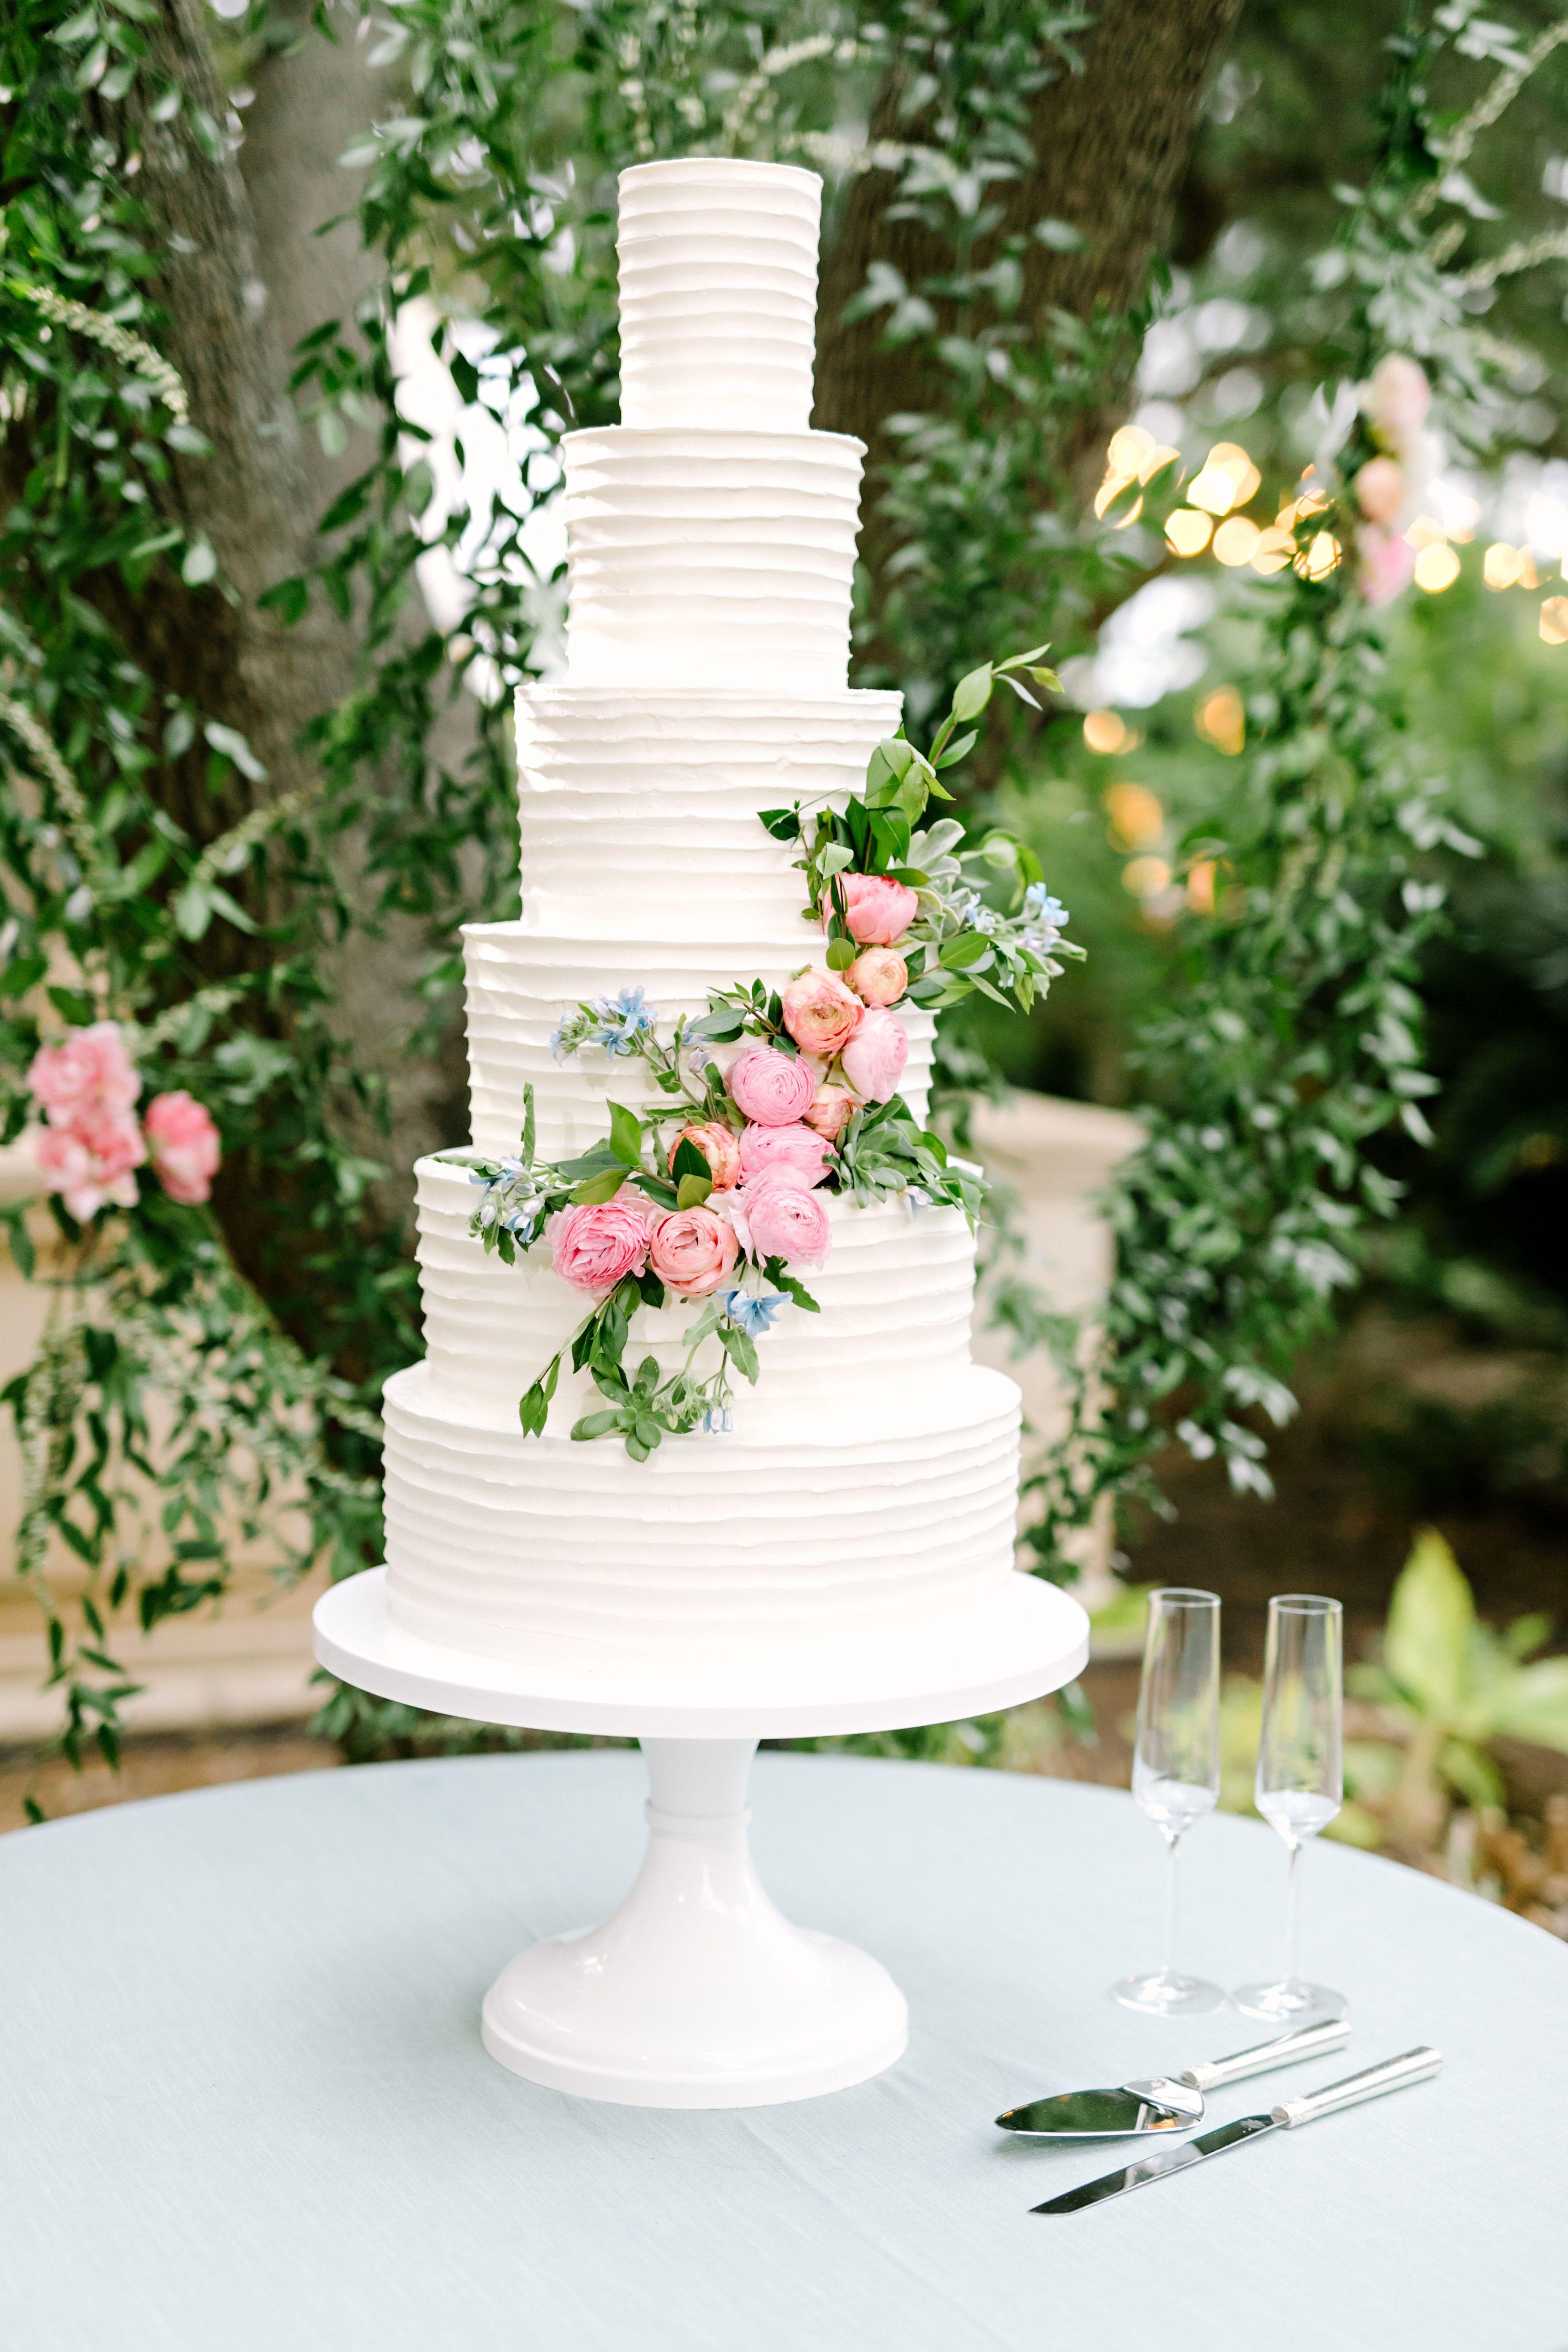 Carley Will S Wedding Wedding Cake Decorations Wedding Cakes